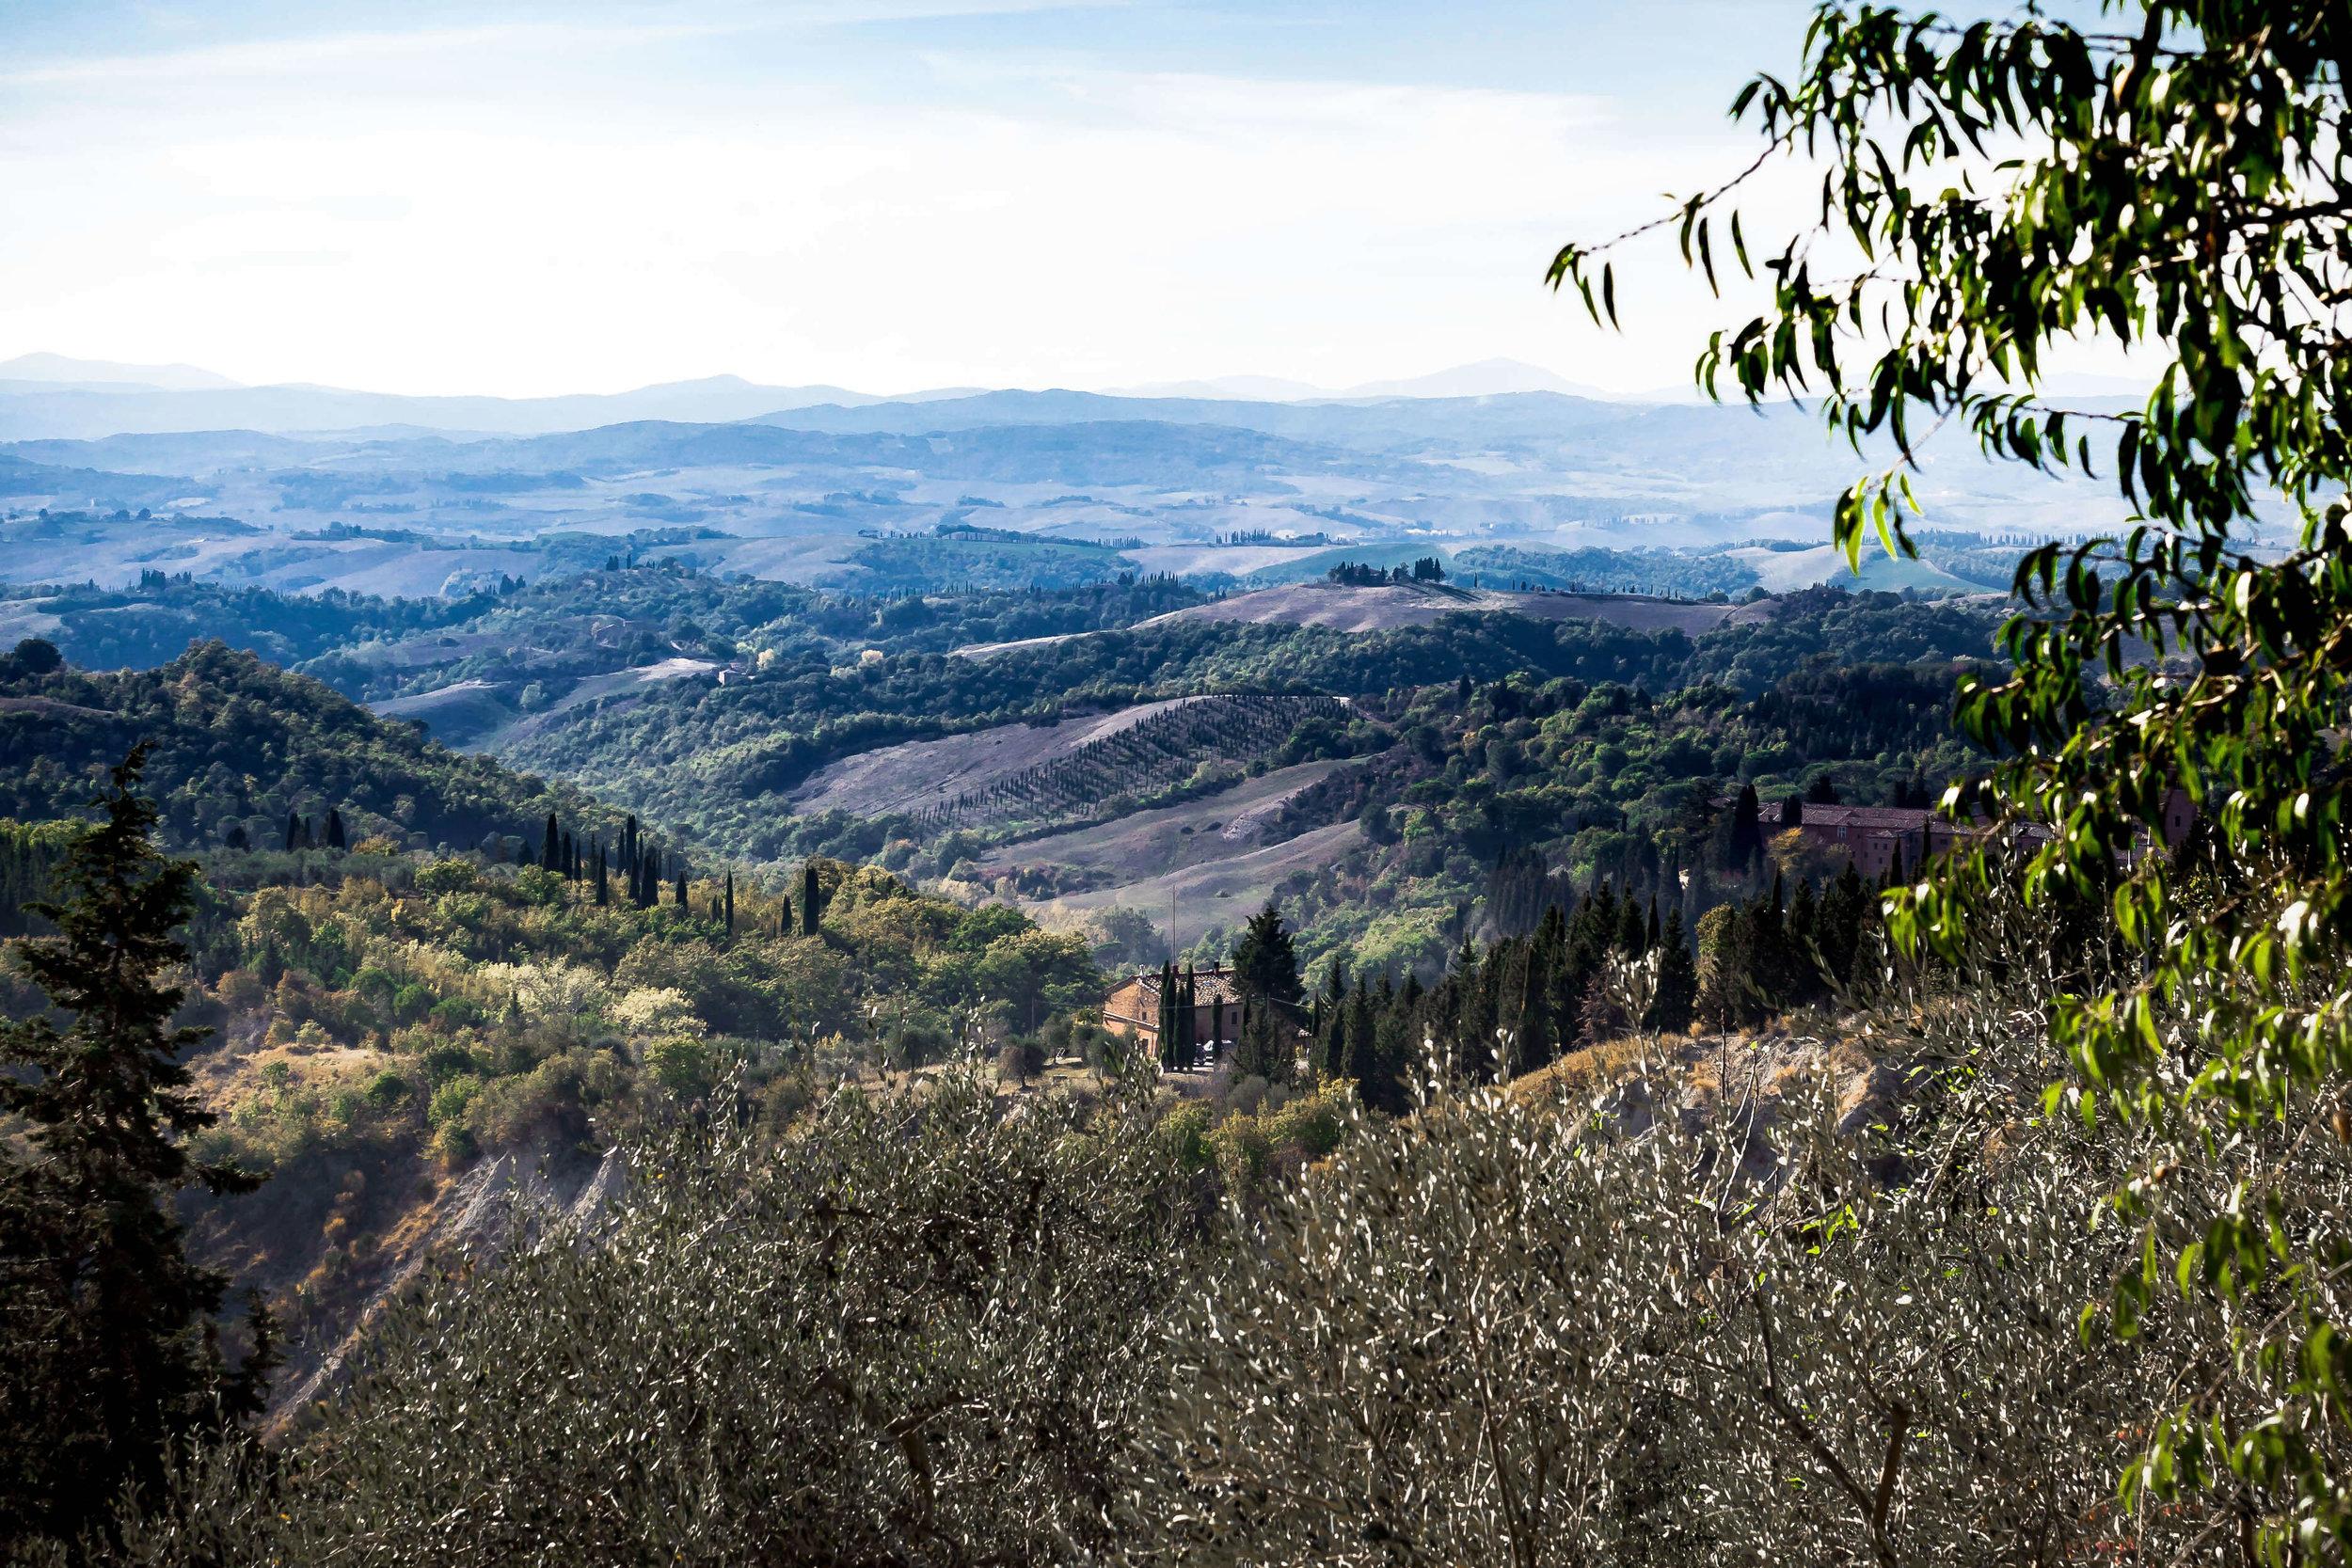 tuscany_view.jpg